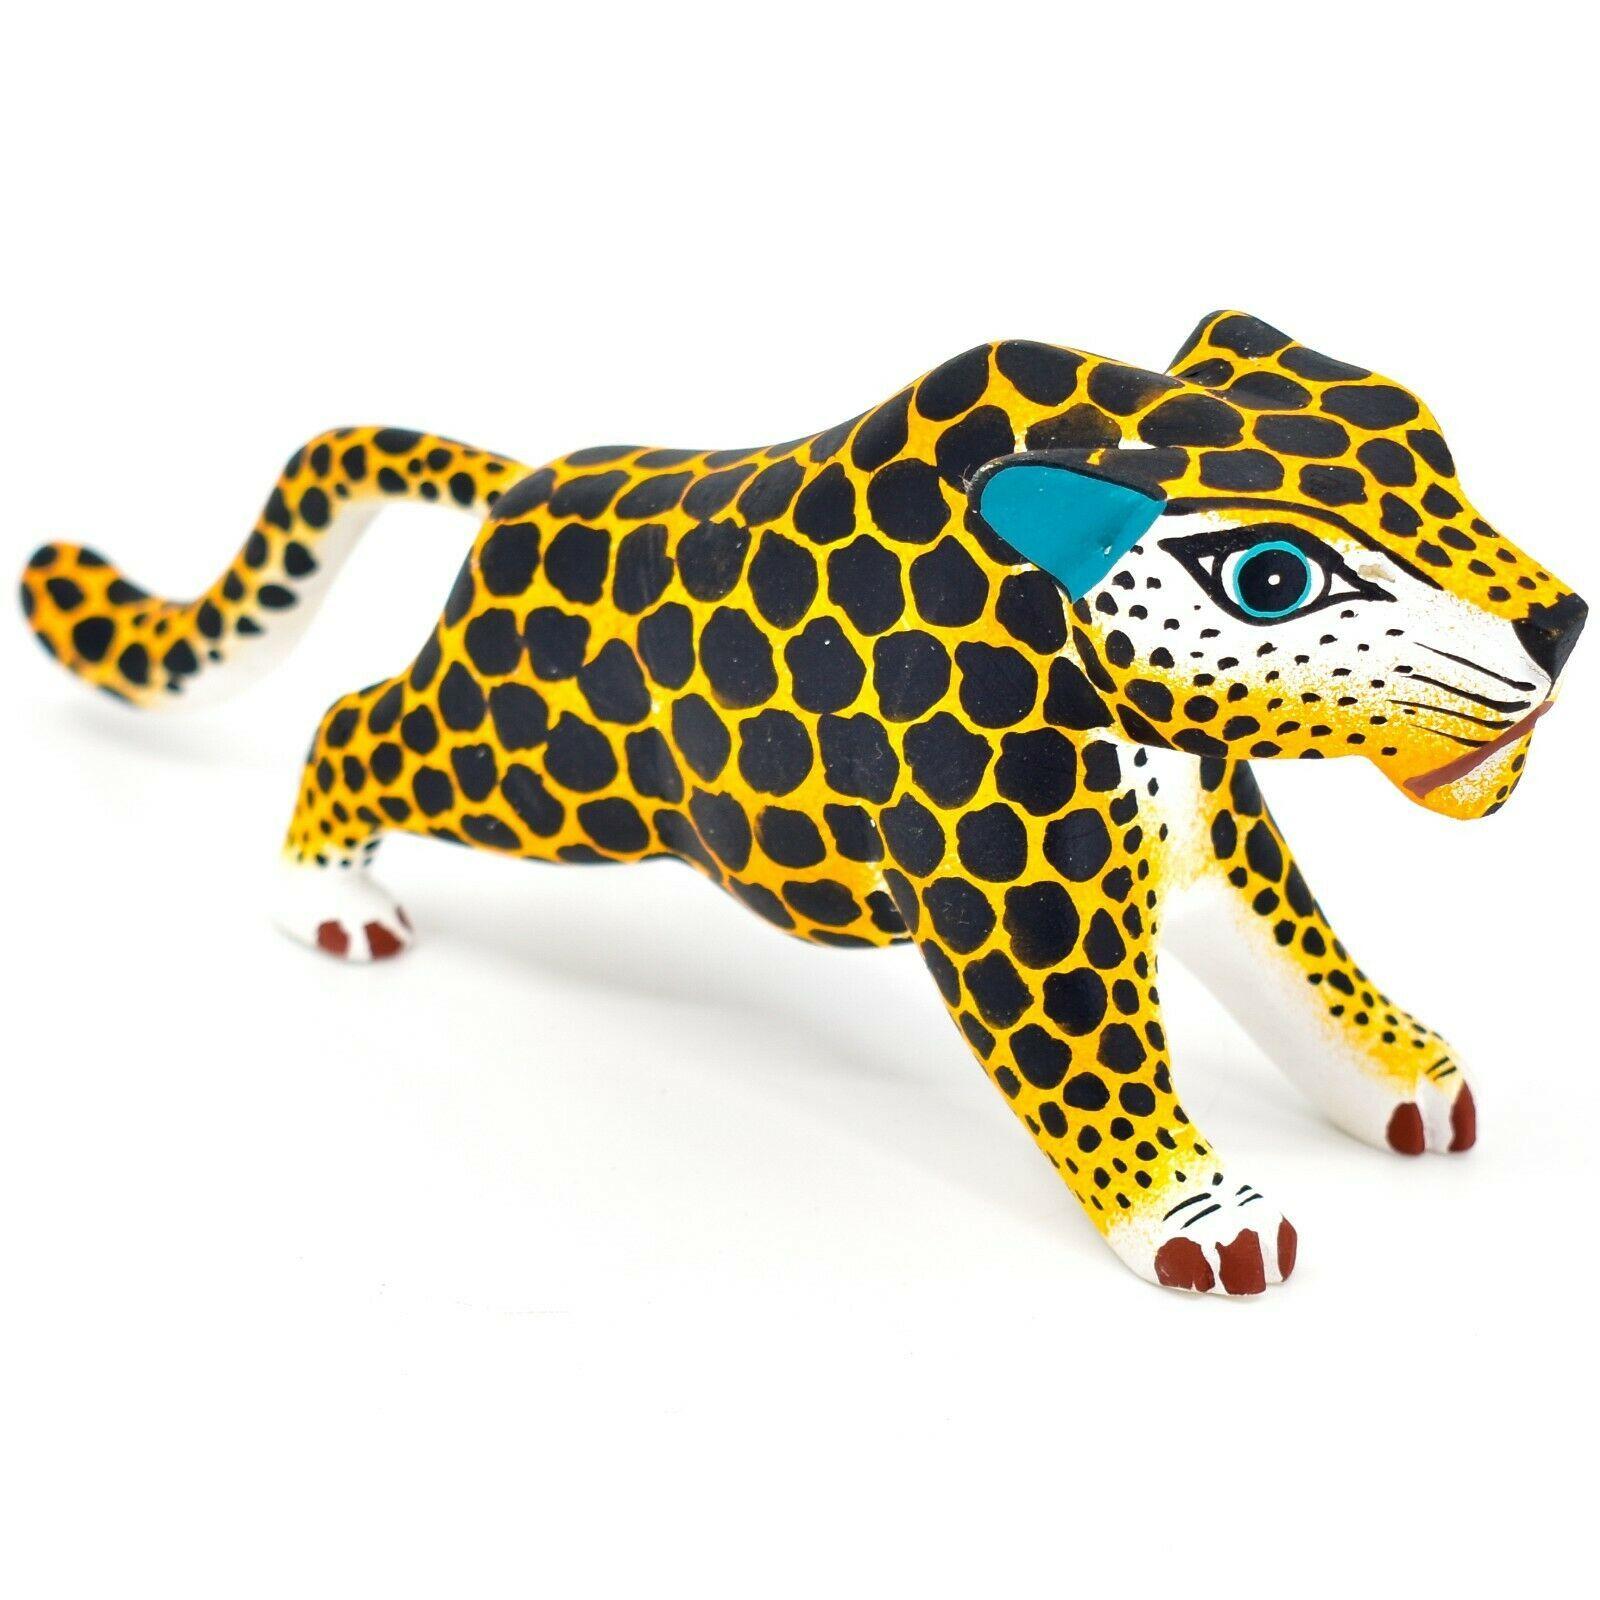 "Handmade Alebrijes Oaxacan Painted Wood Folk Art Leopard Jaguar 7"" Figurine"